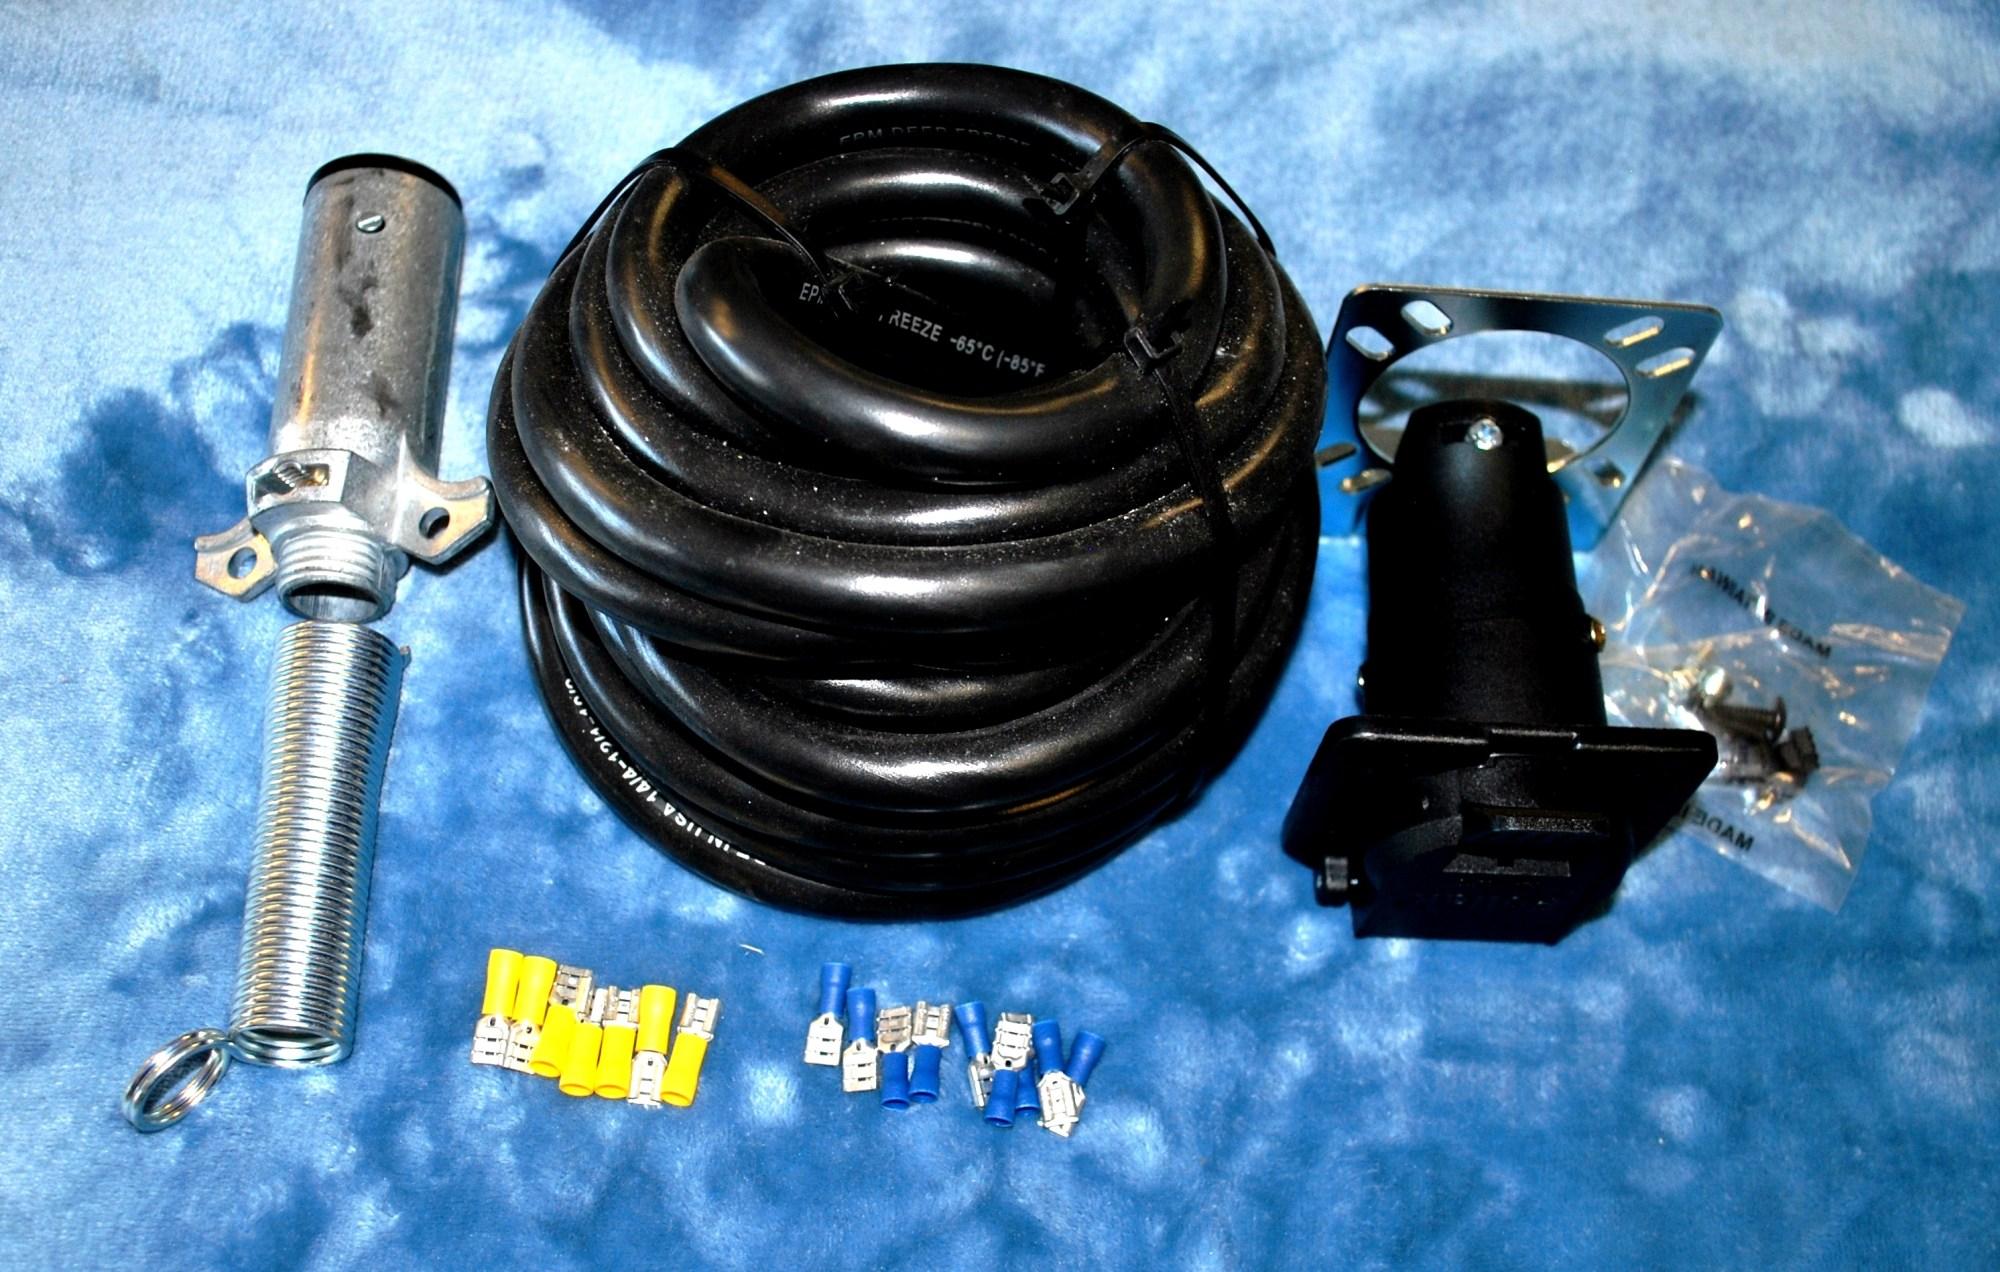 hight resolution of jackalopee wiring kit